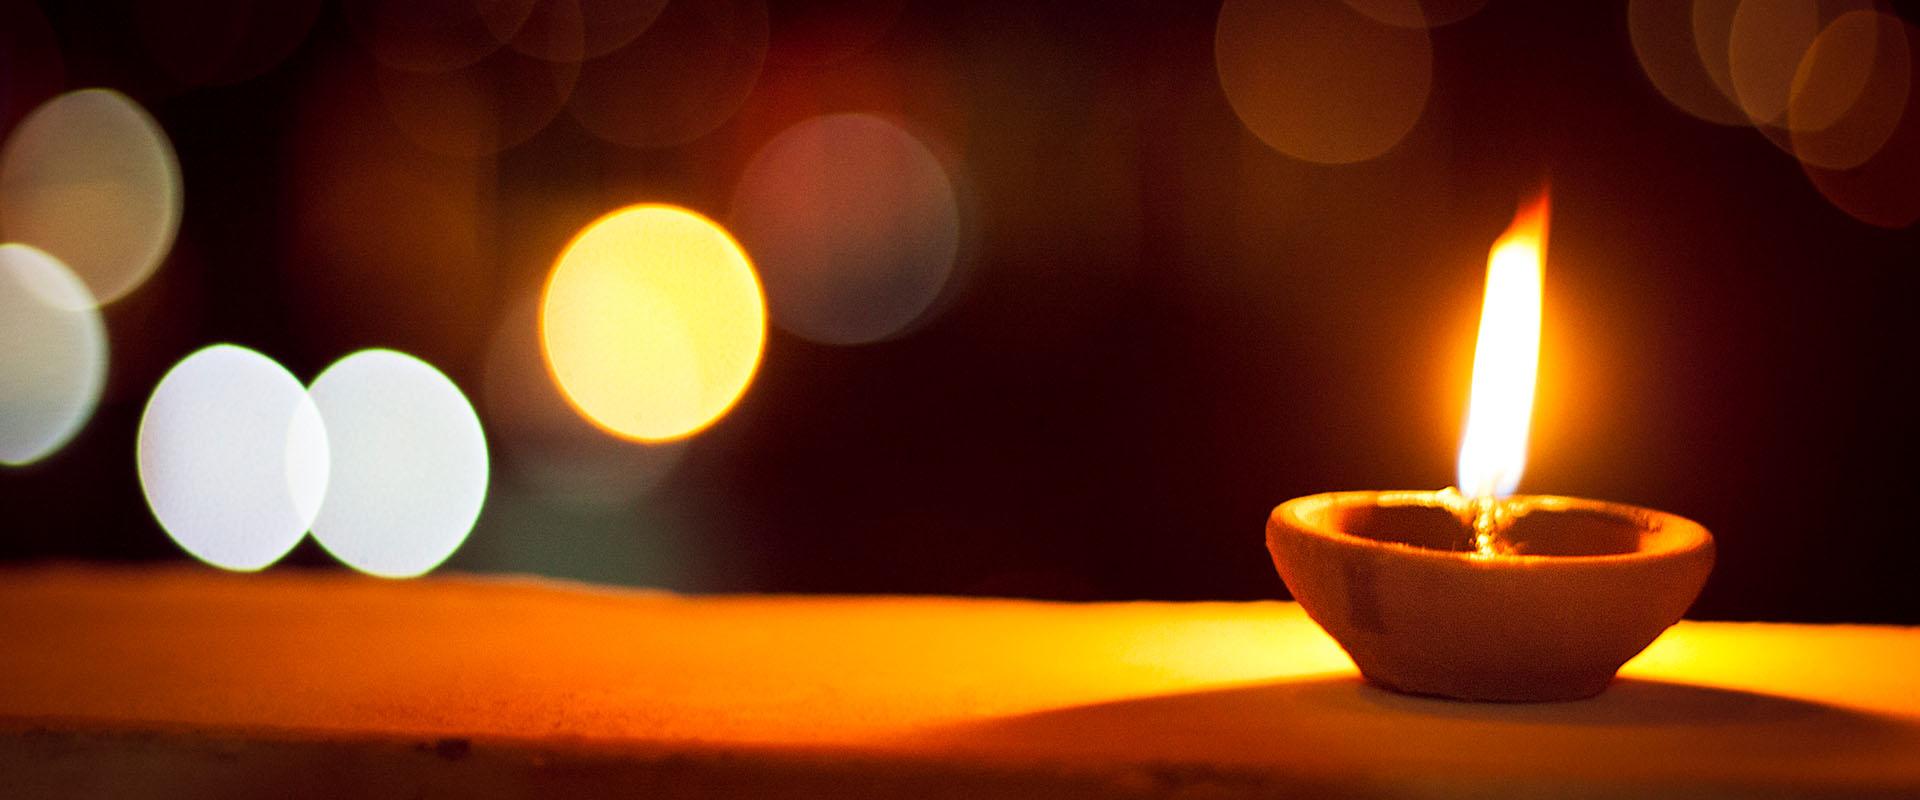 India_Diwali_1920_800